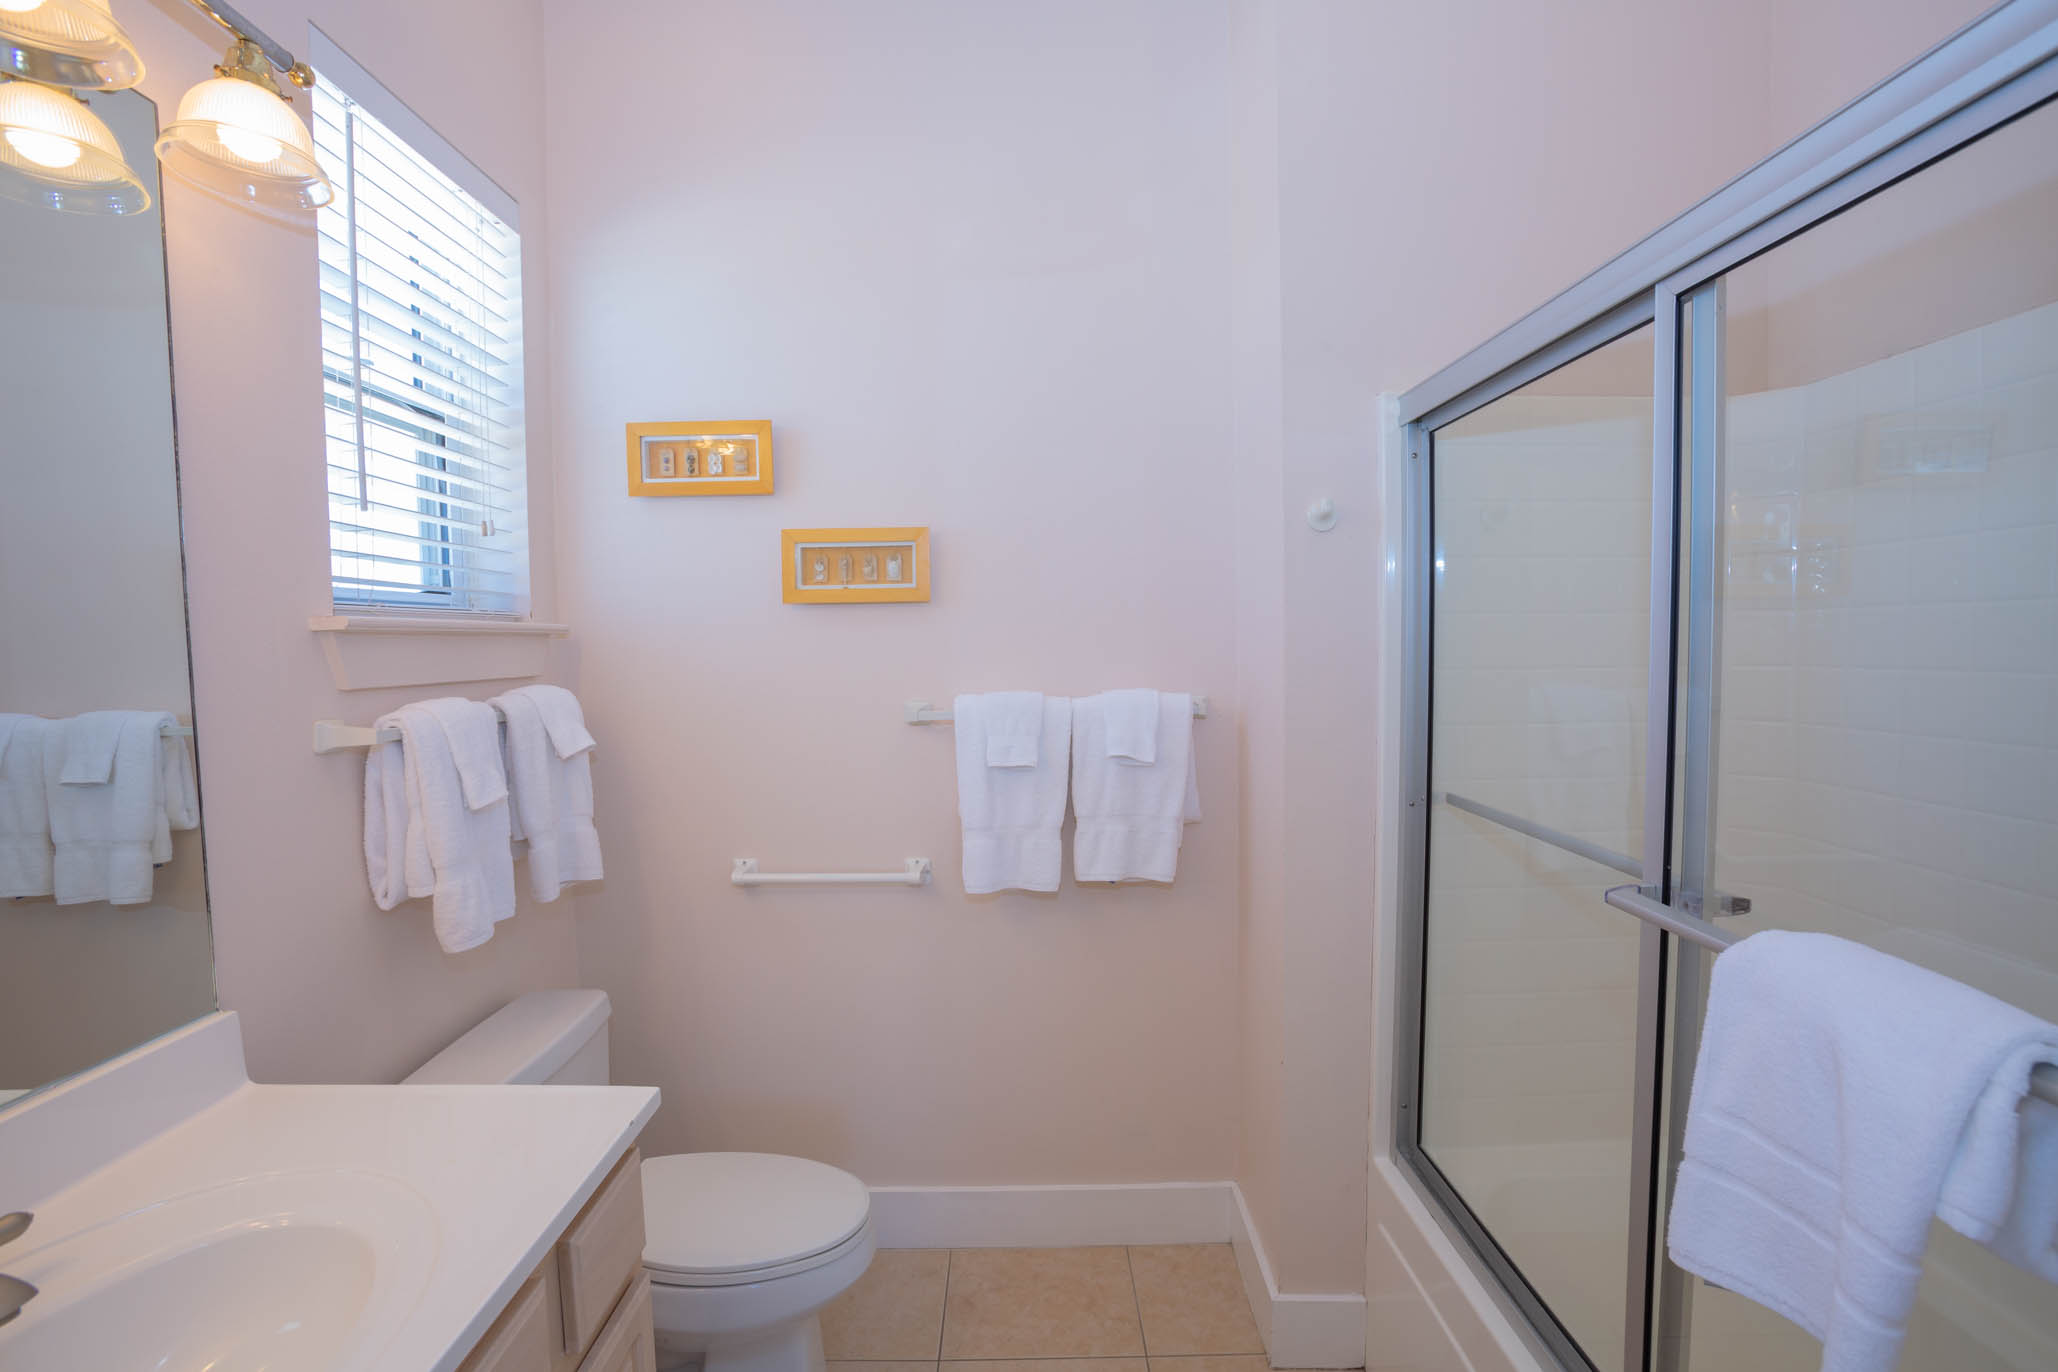 Ariola 1214 House/Cottage rental in Luxury Homes in Pensacola Beach Florida - #35